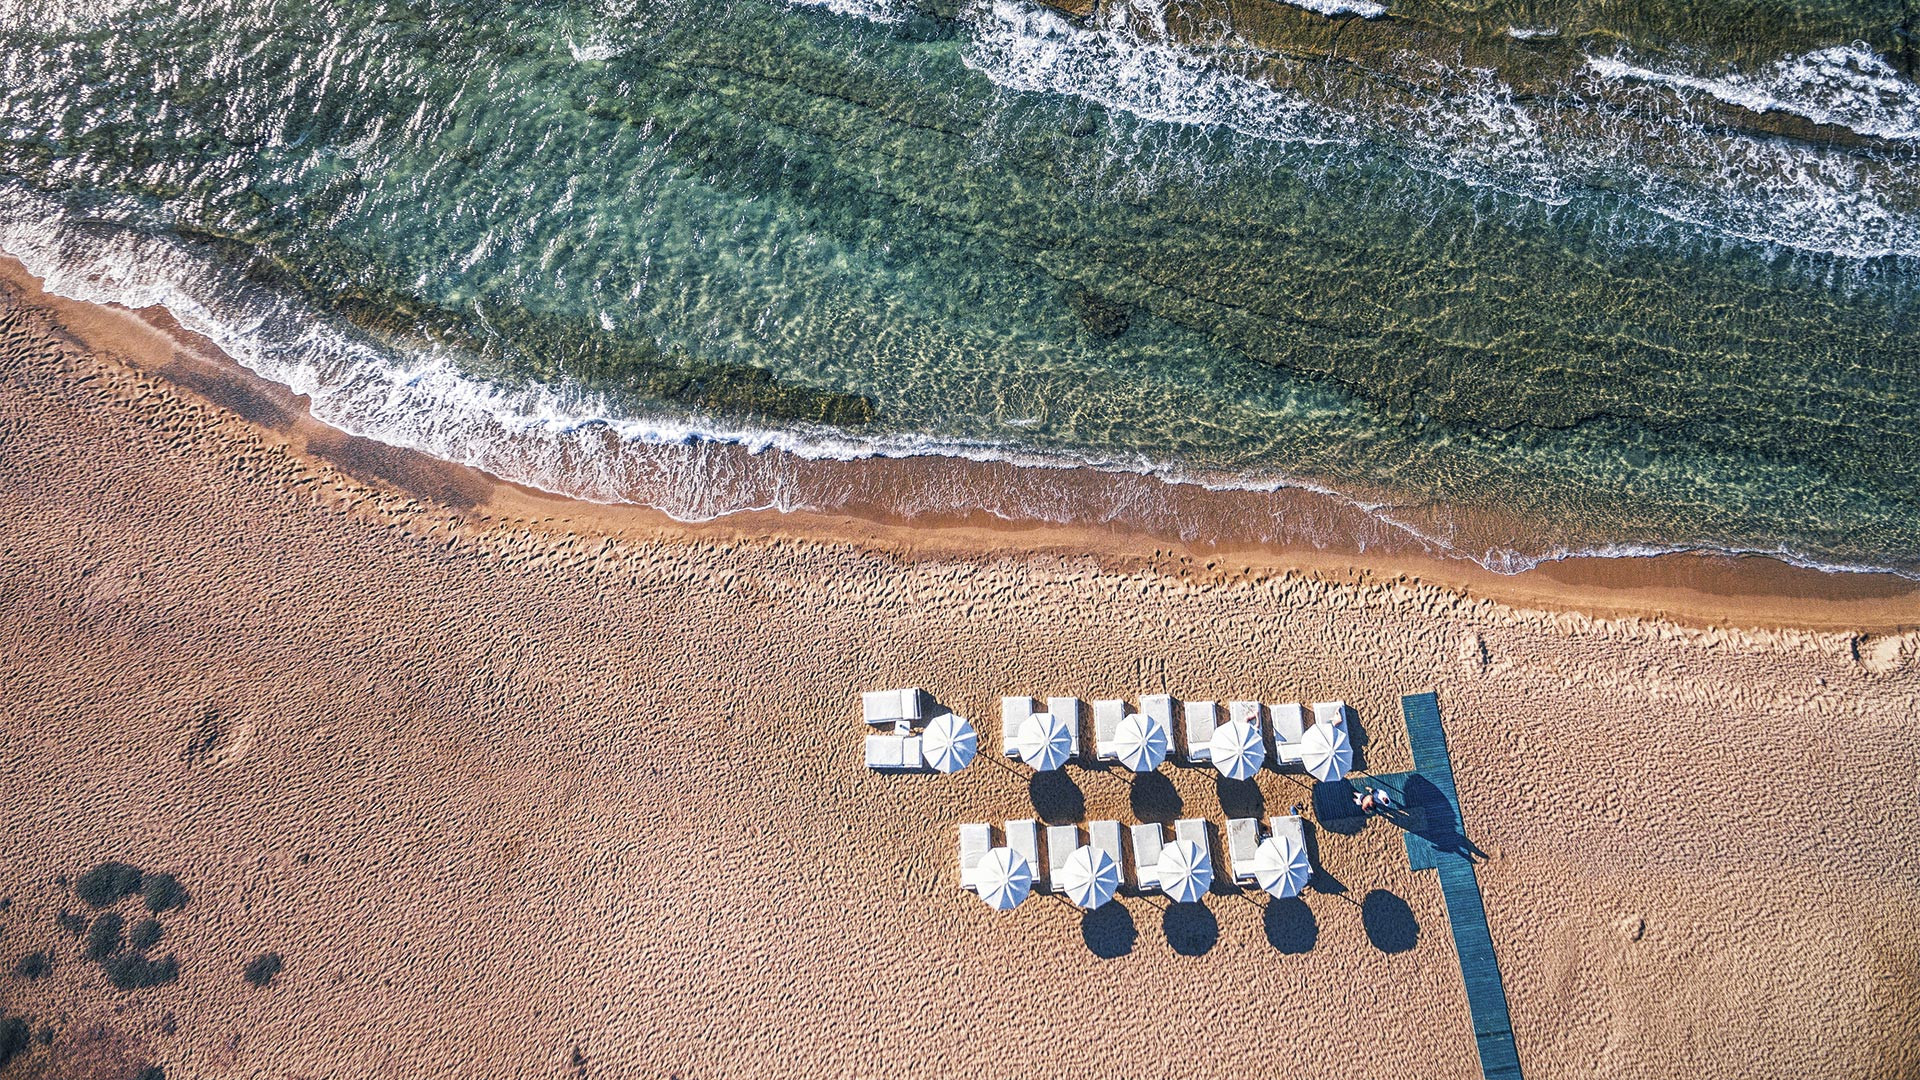 Drone photo of Mykonos Bay Ceach in Greece